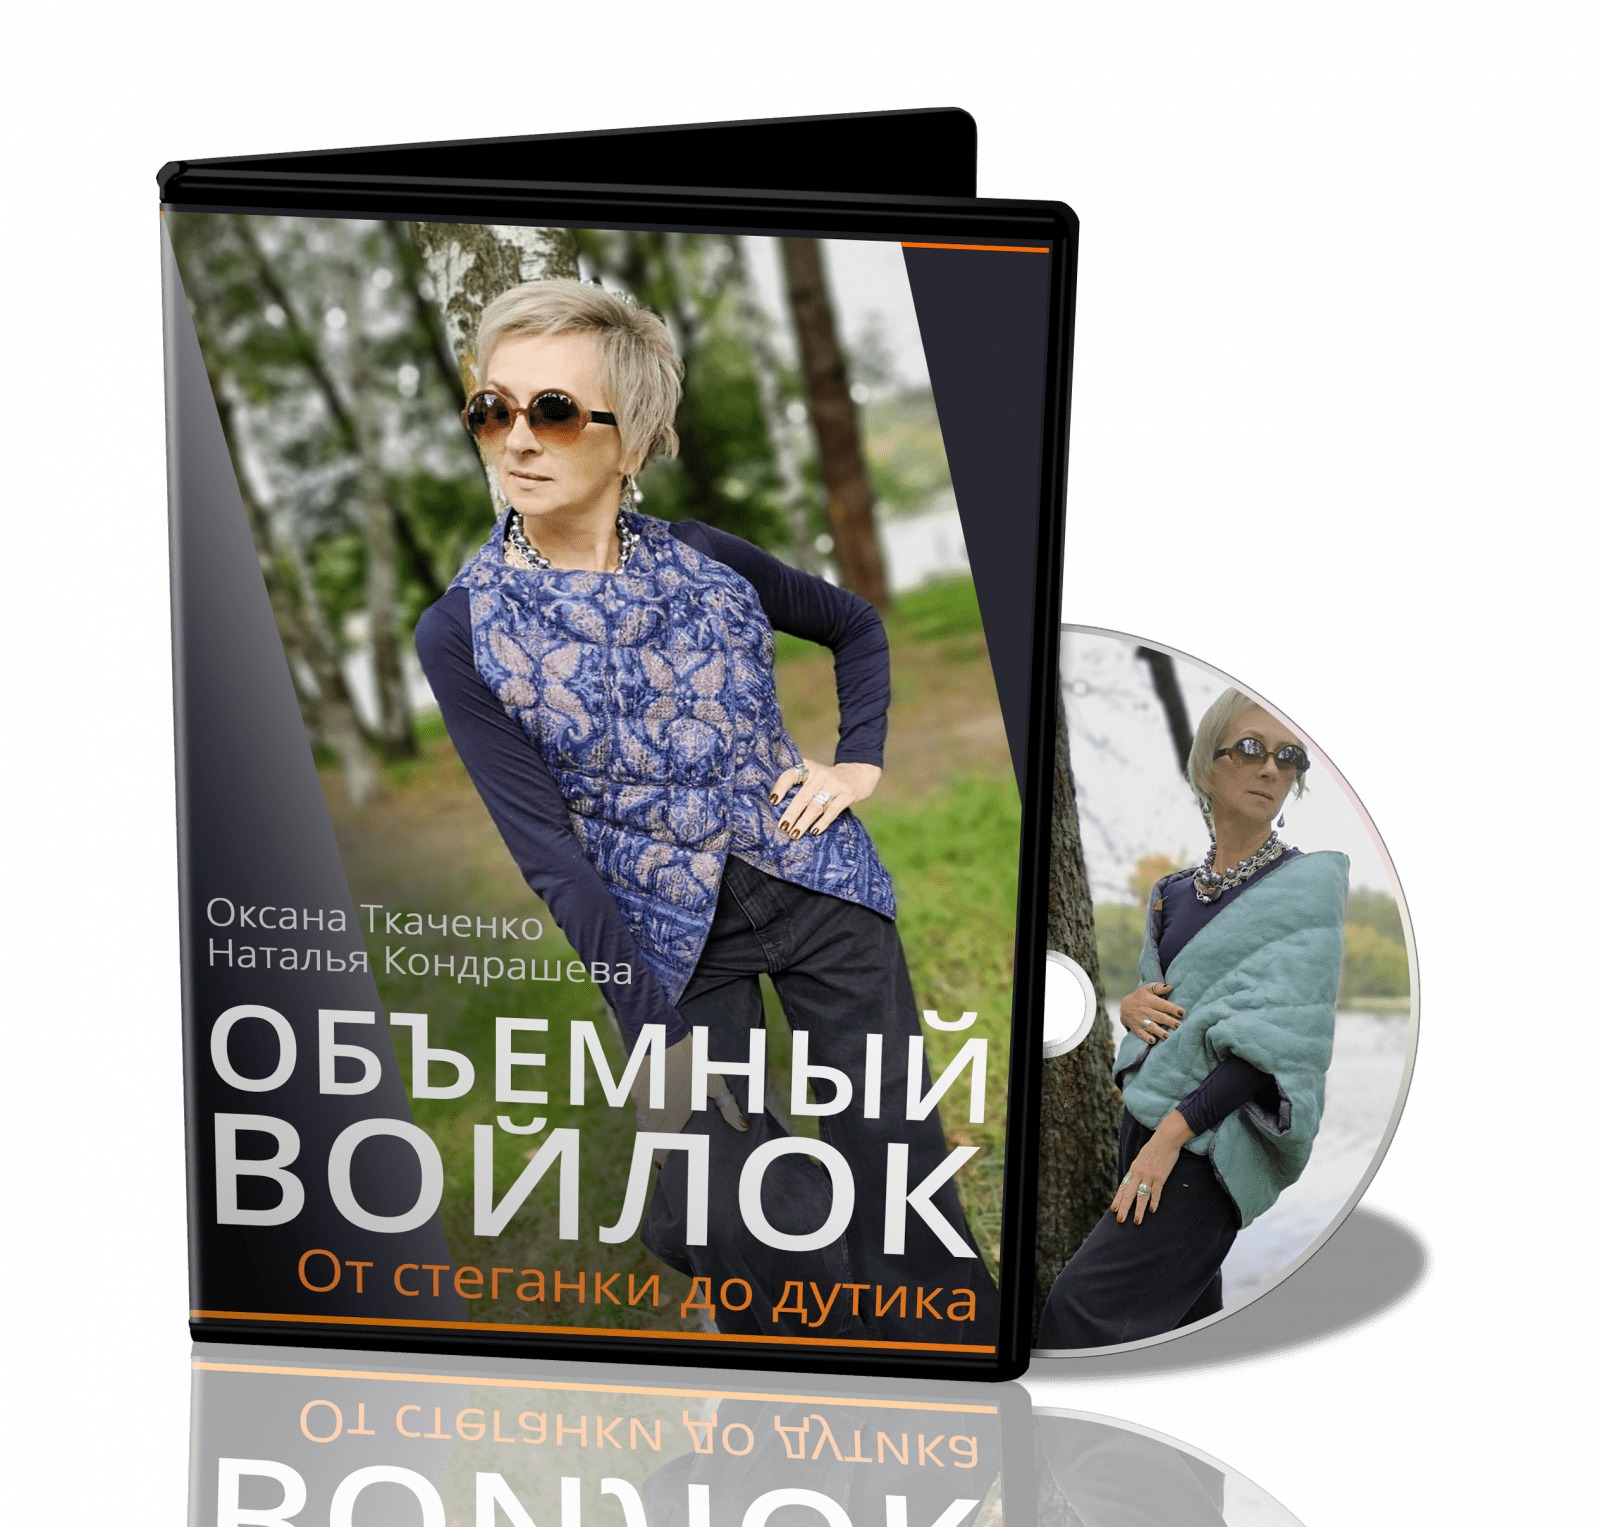 О.Ткаченко и Н.Кондрашева. Объемный войлок. От стеганки до дутика